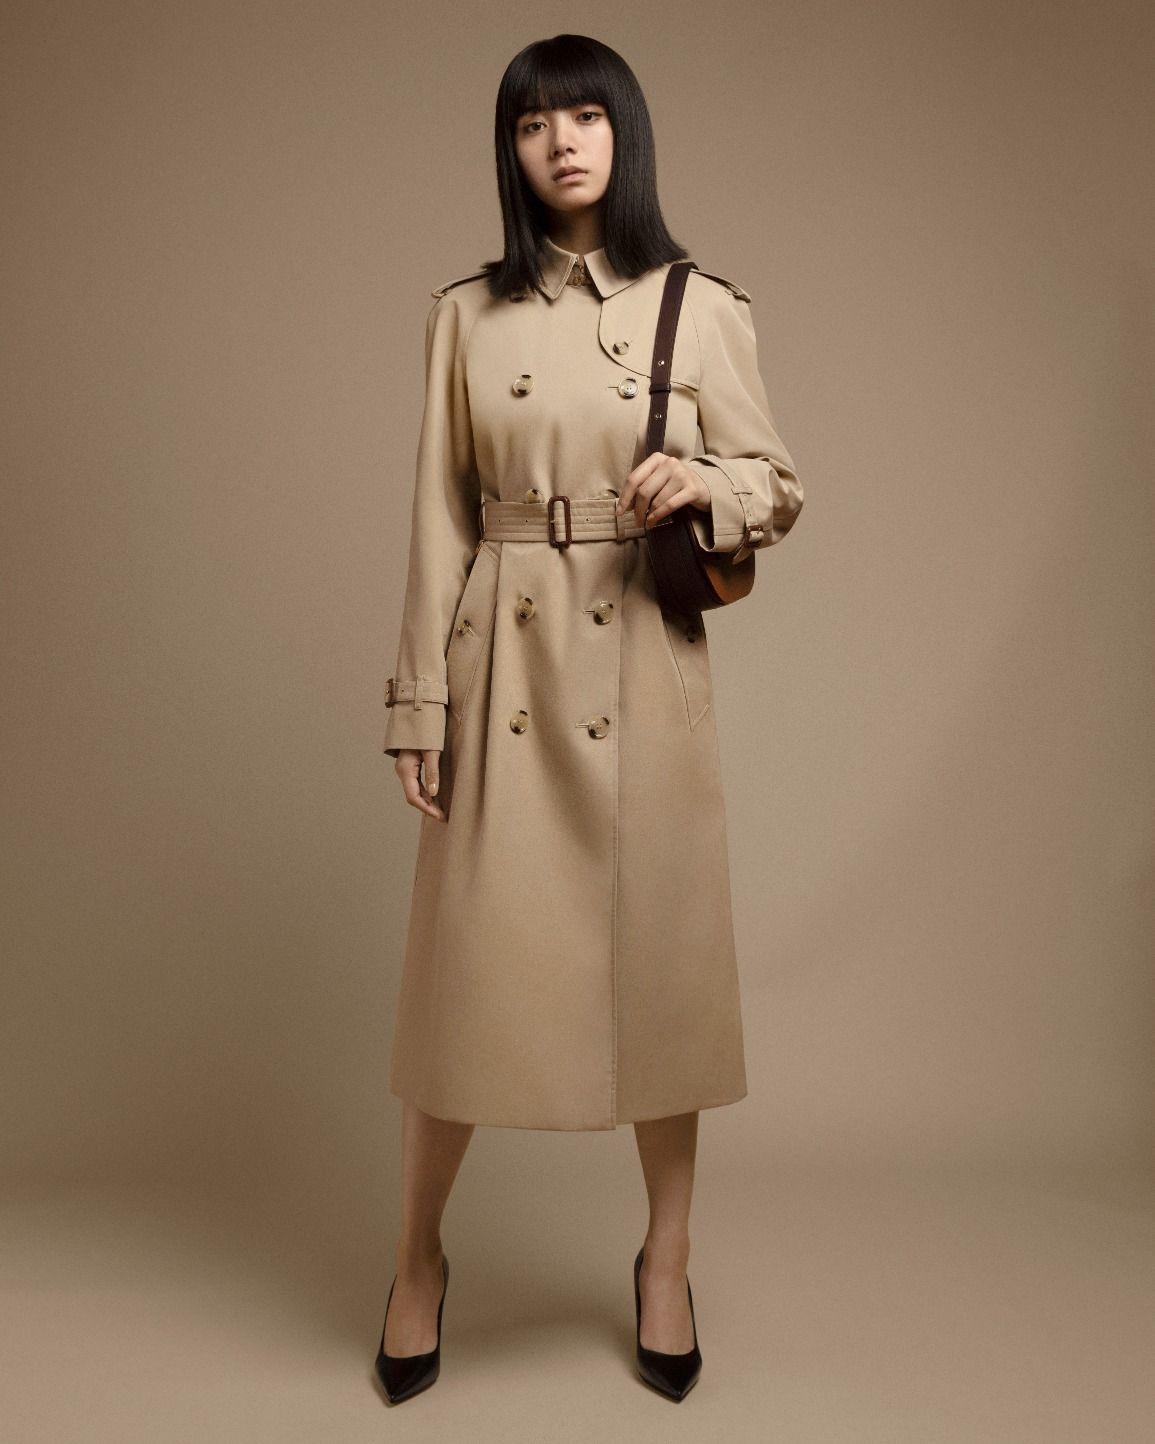 Burberry appoints Elaiza Ikeda as its first Japan ambassador